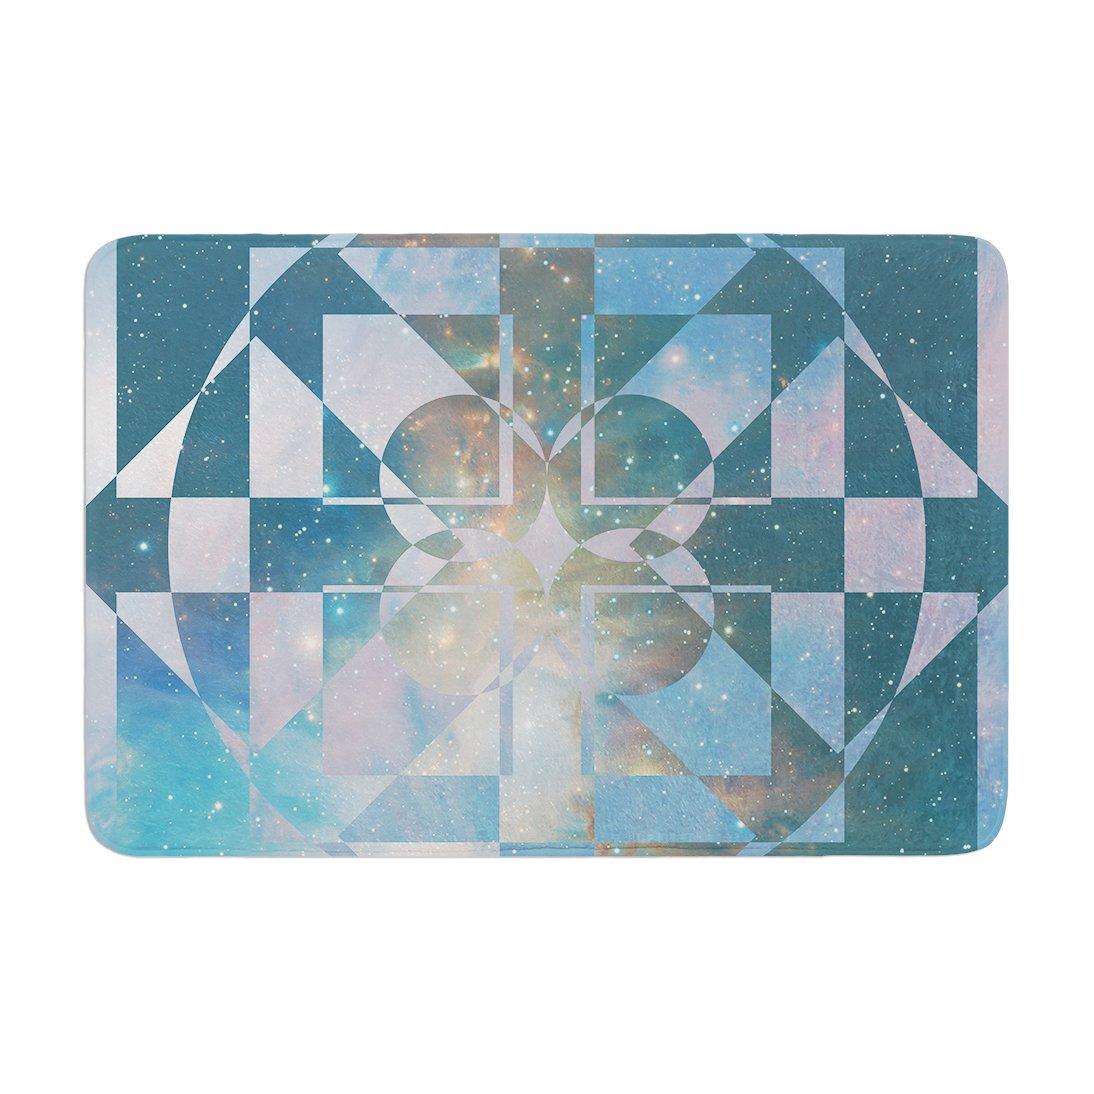 Kess InHouse Matt Eklund Galactic Hope Aqua Blue Memory Foam Bath Mat 17 by 24